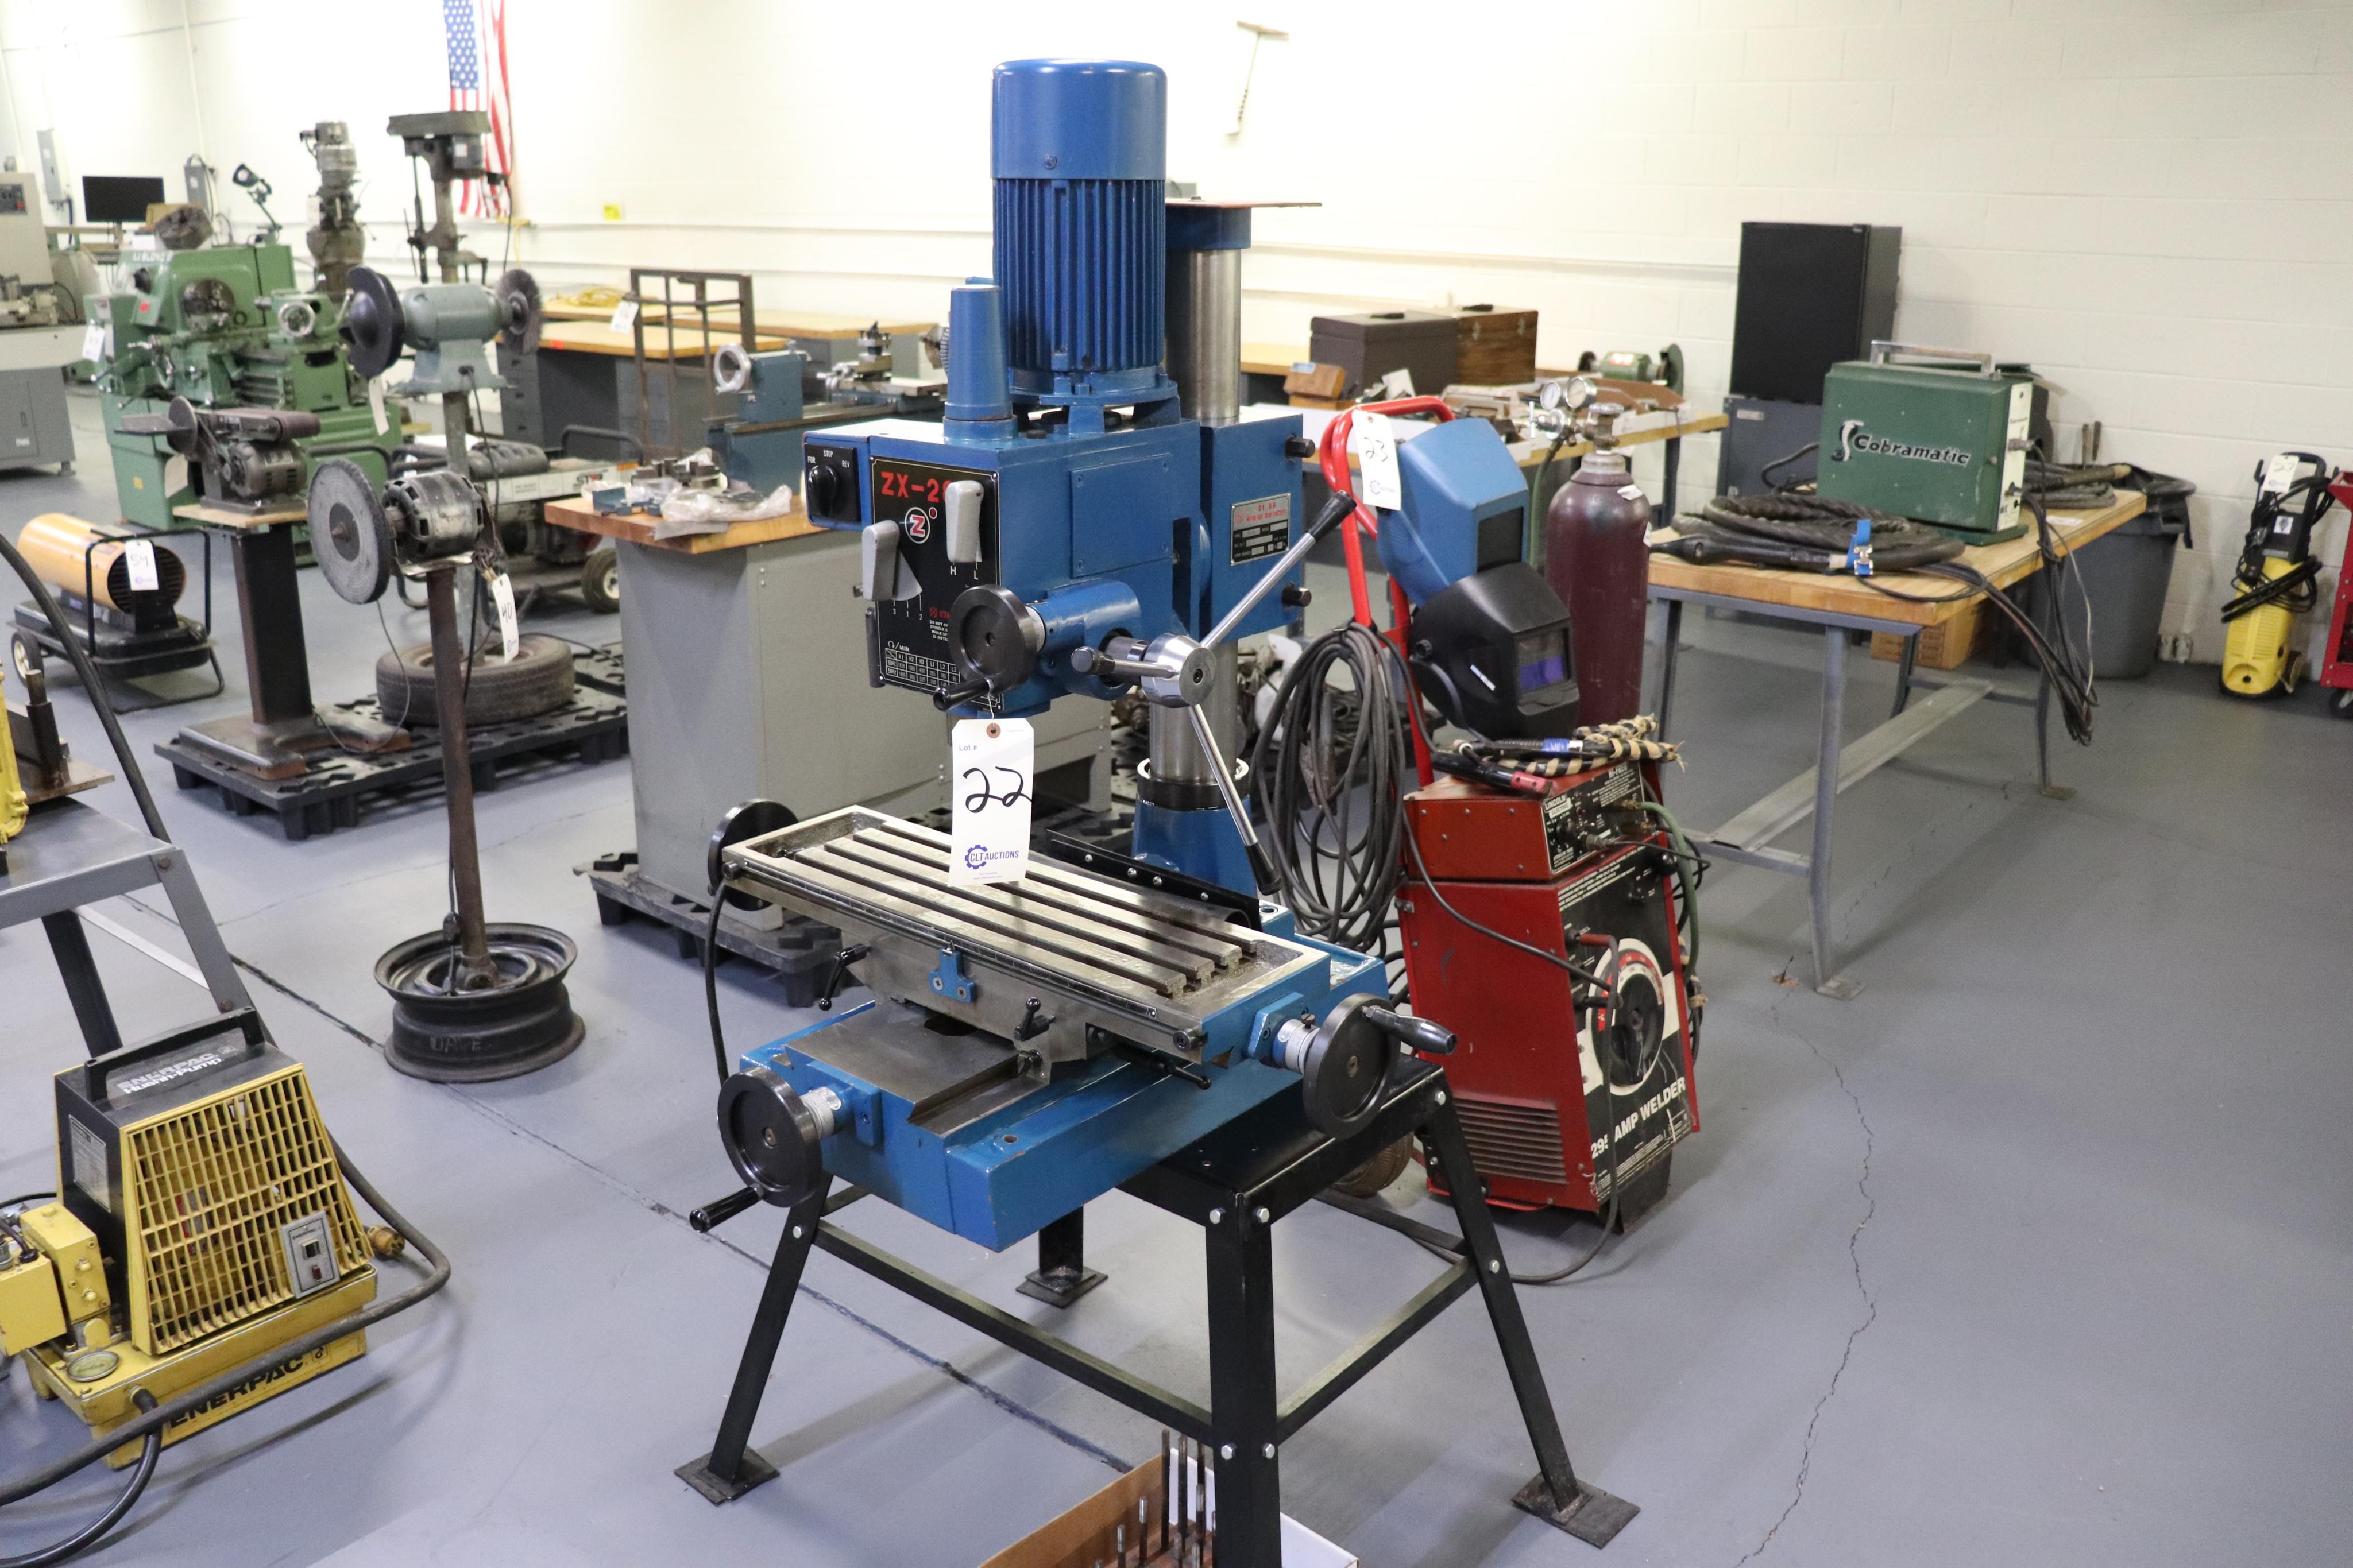 Motor-Car Gear Factory ZX-28 vertical milling machine